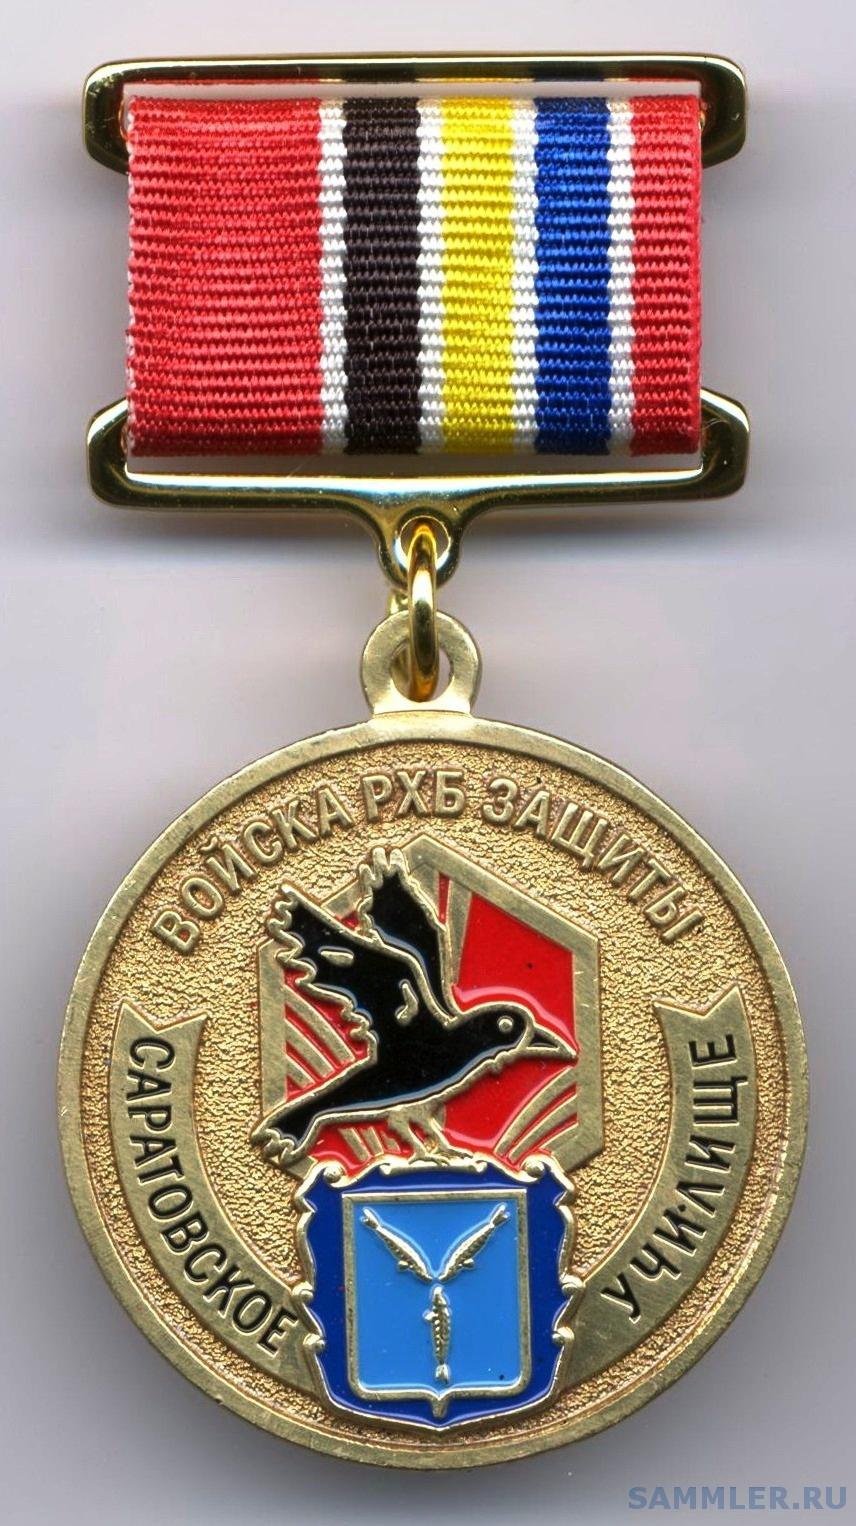 Медаль СВИРХБЗ 1.jpg